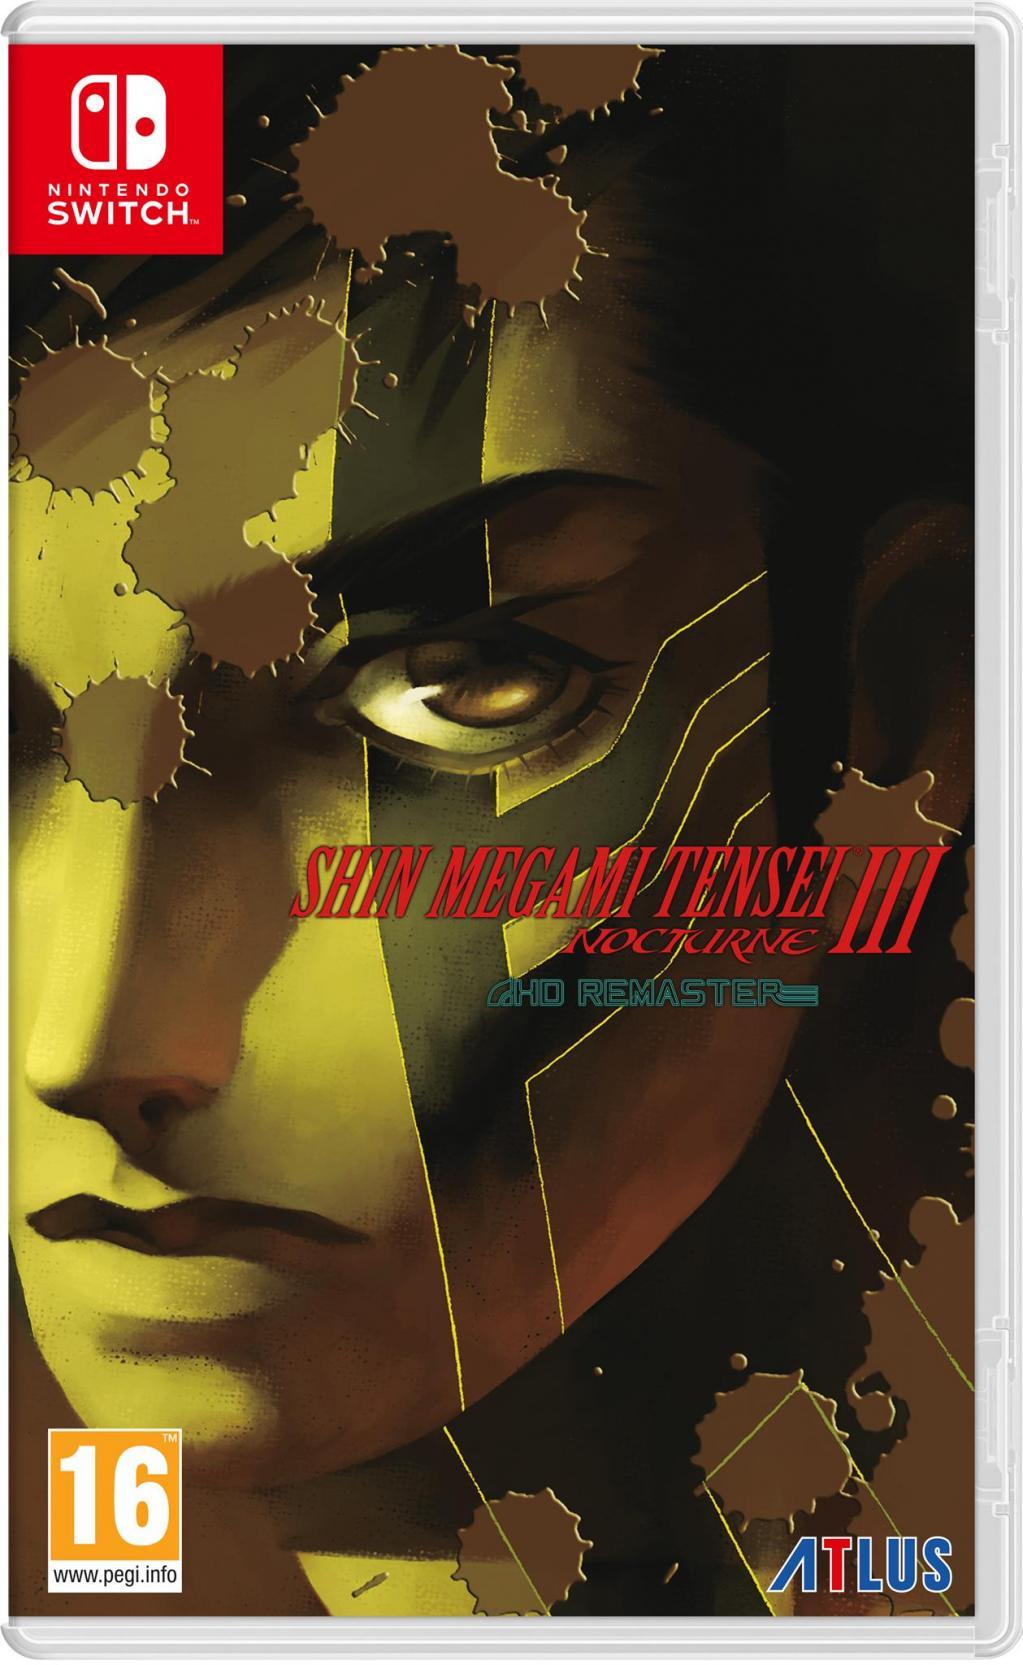 Shin Megami Tensei 3 Nocturne HD Remaster / JPN UK (voice) - E F I G S_1